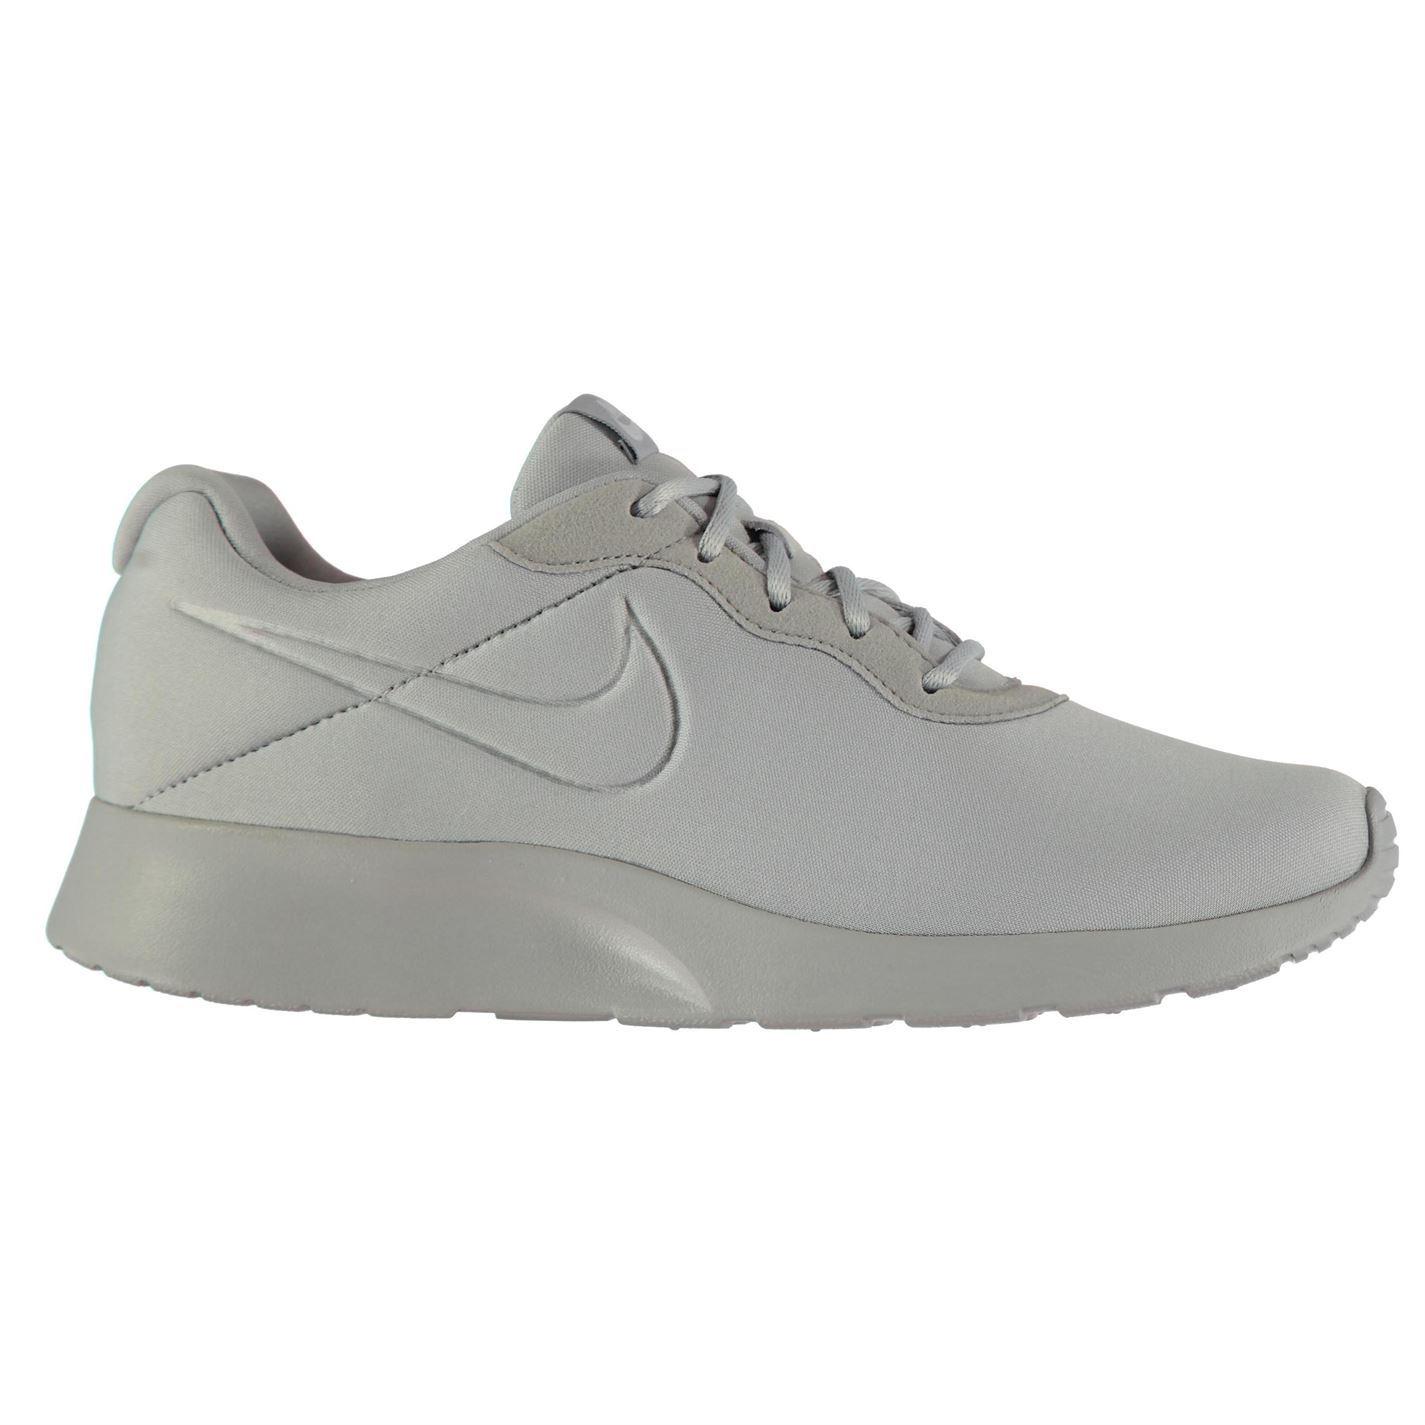 b1d5ac696dd Nike Tanjun Premium Zapatillas Running Hombre Fitness Trote ...